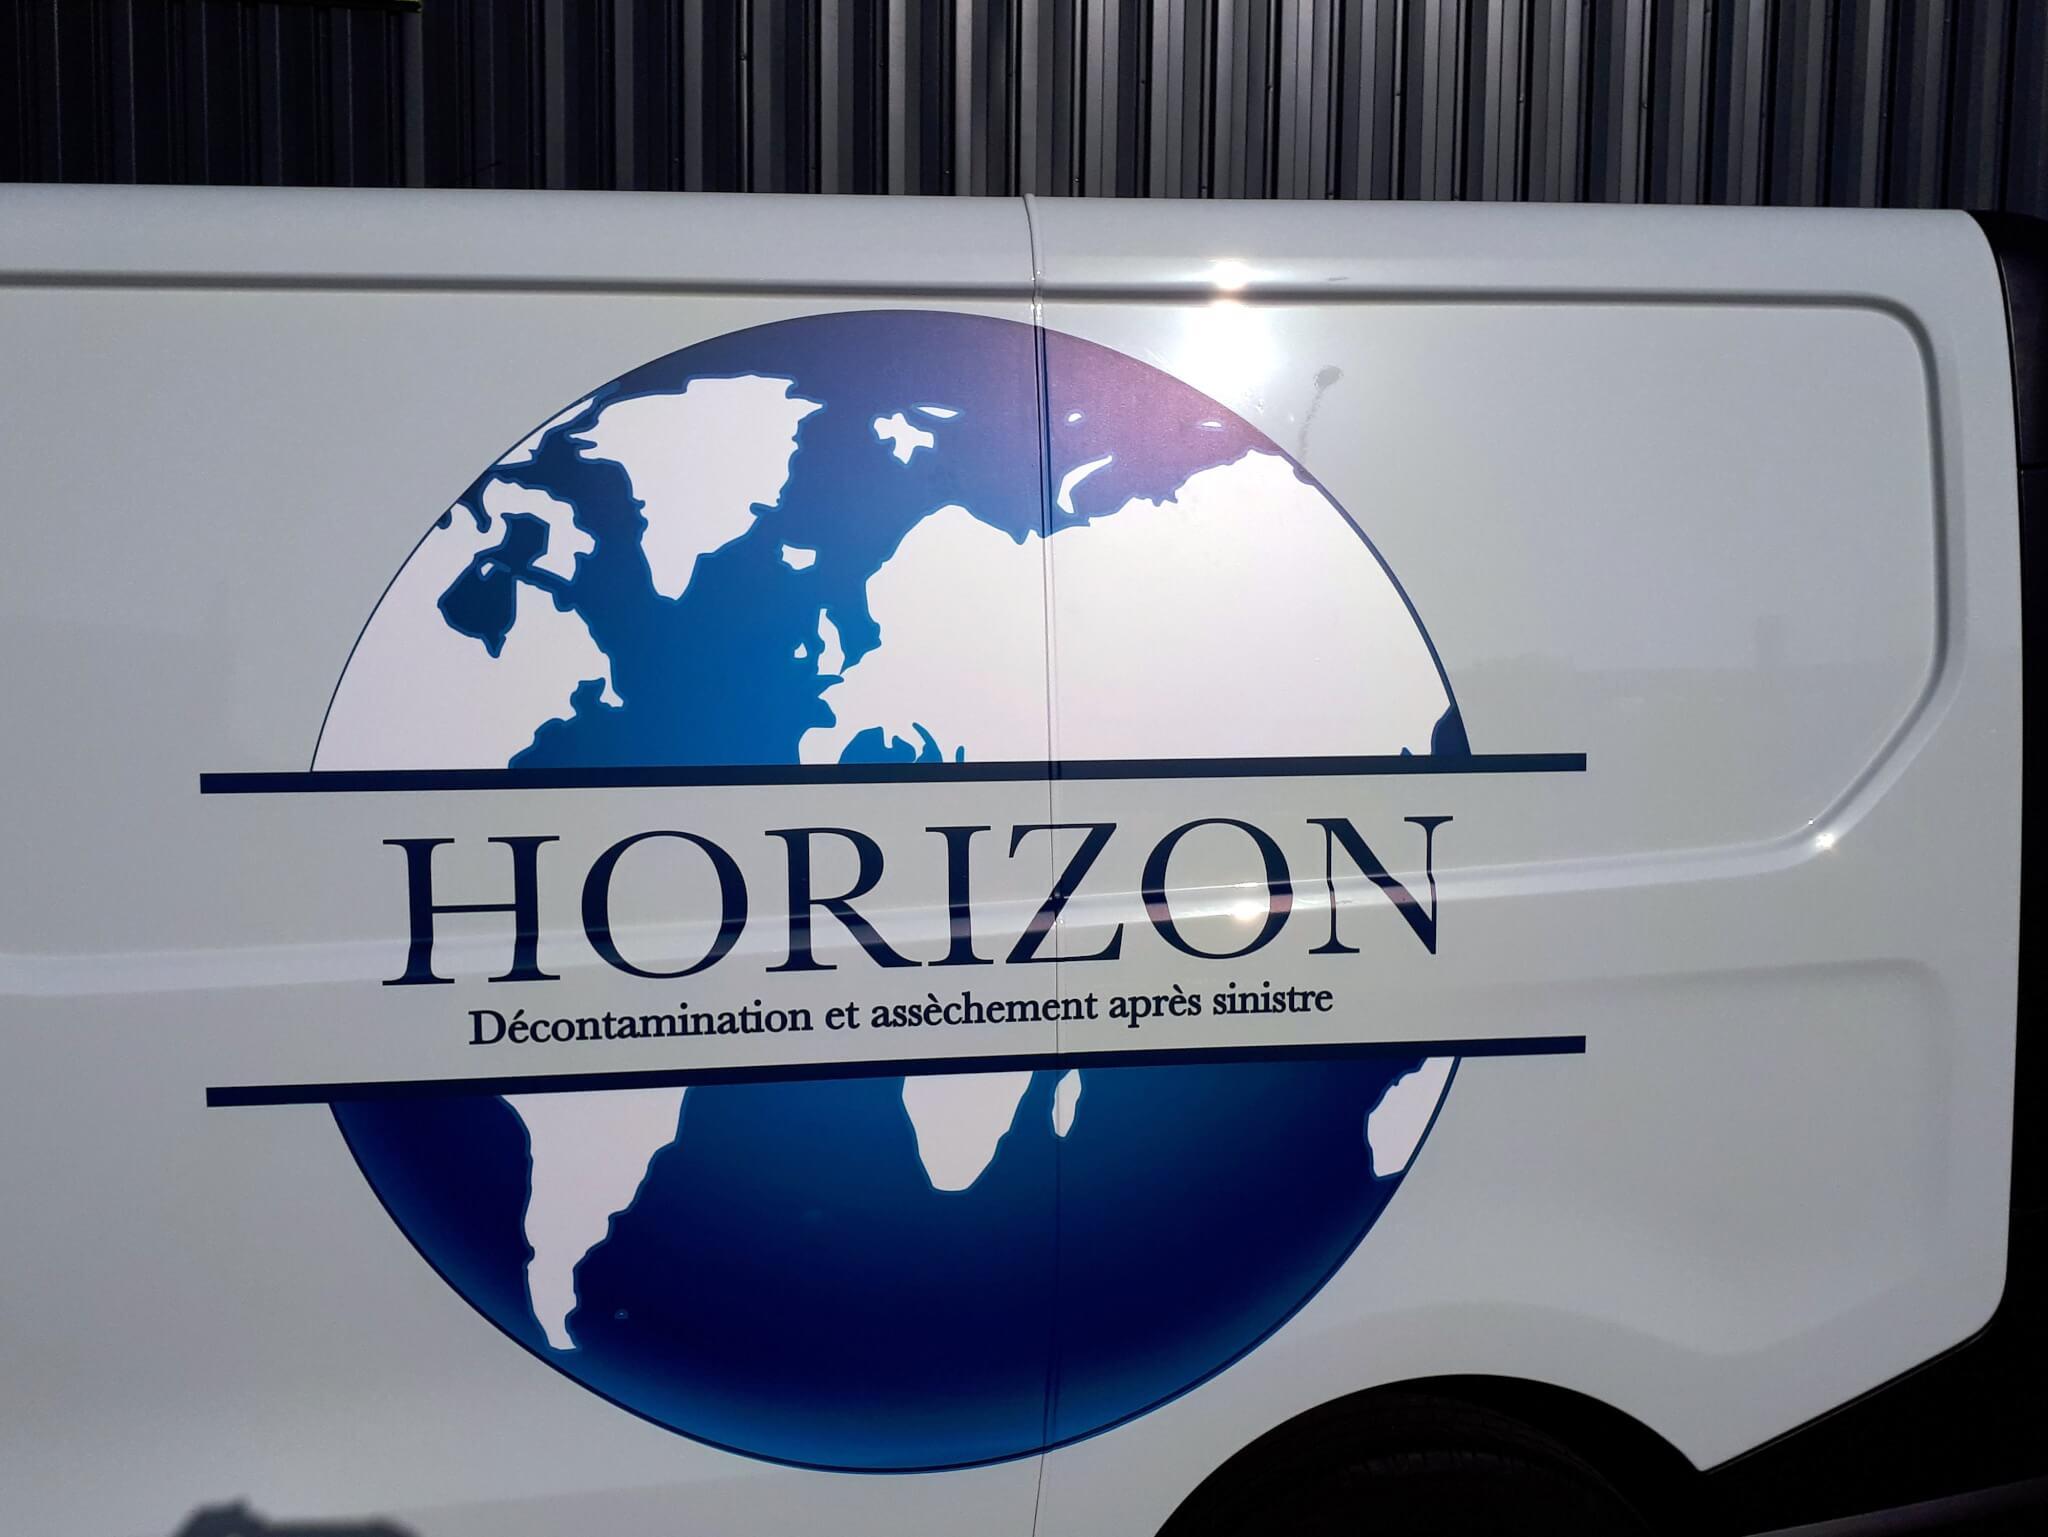 Covering Lyon Utilitaire Horizon